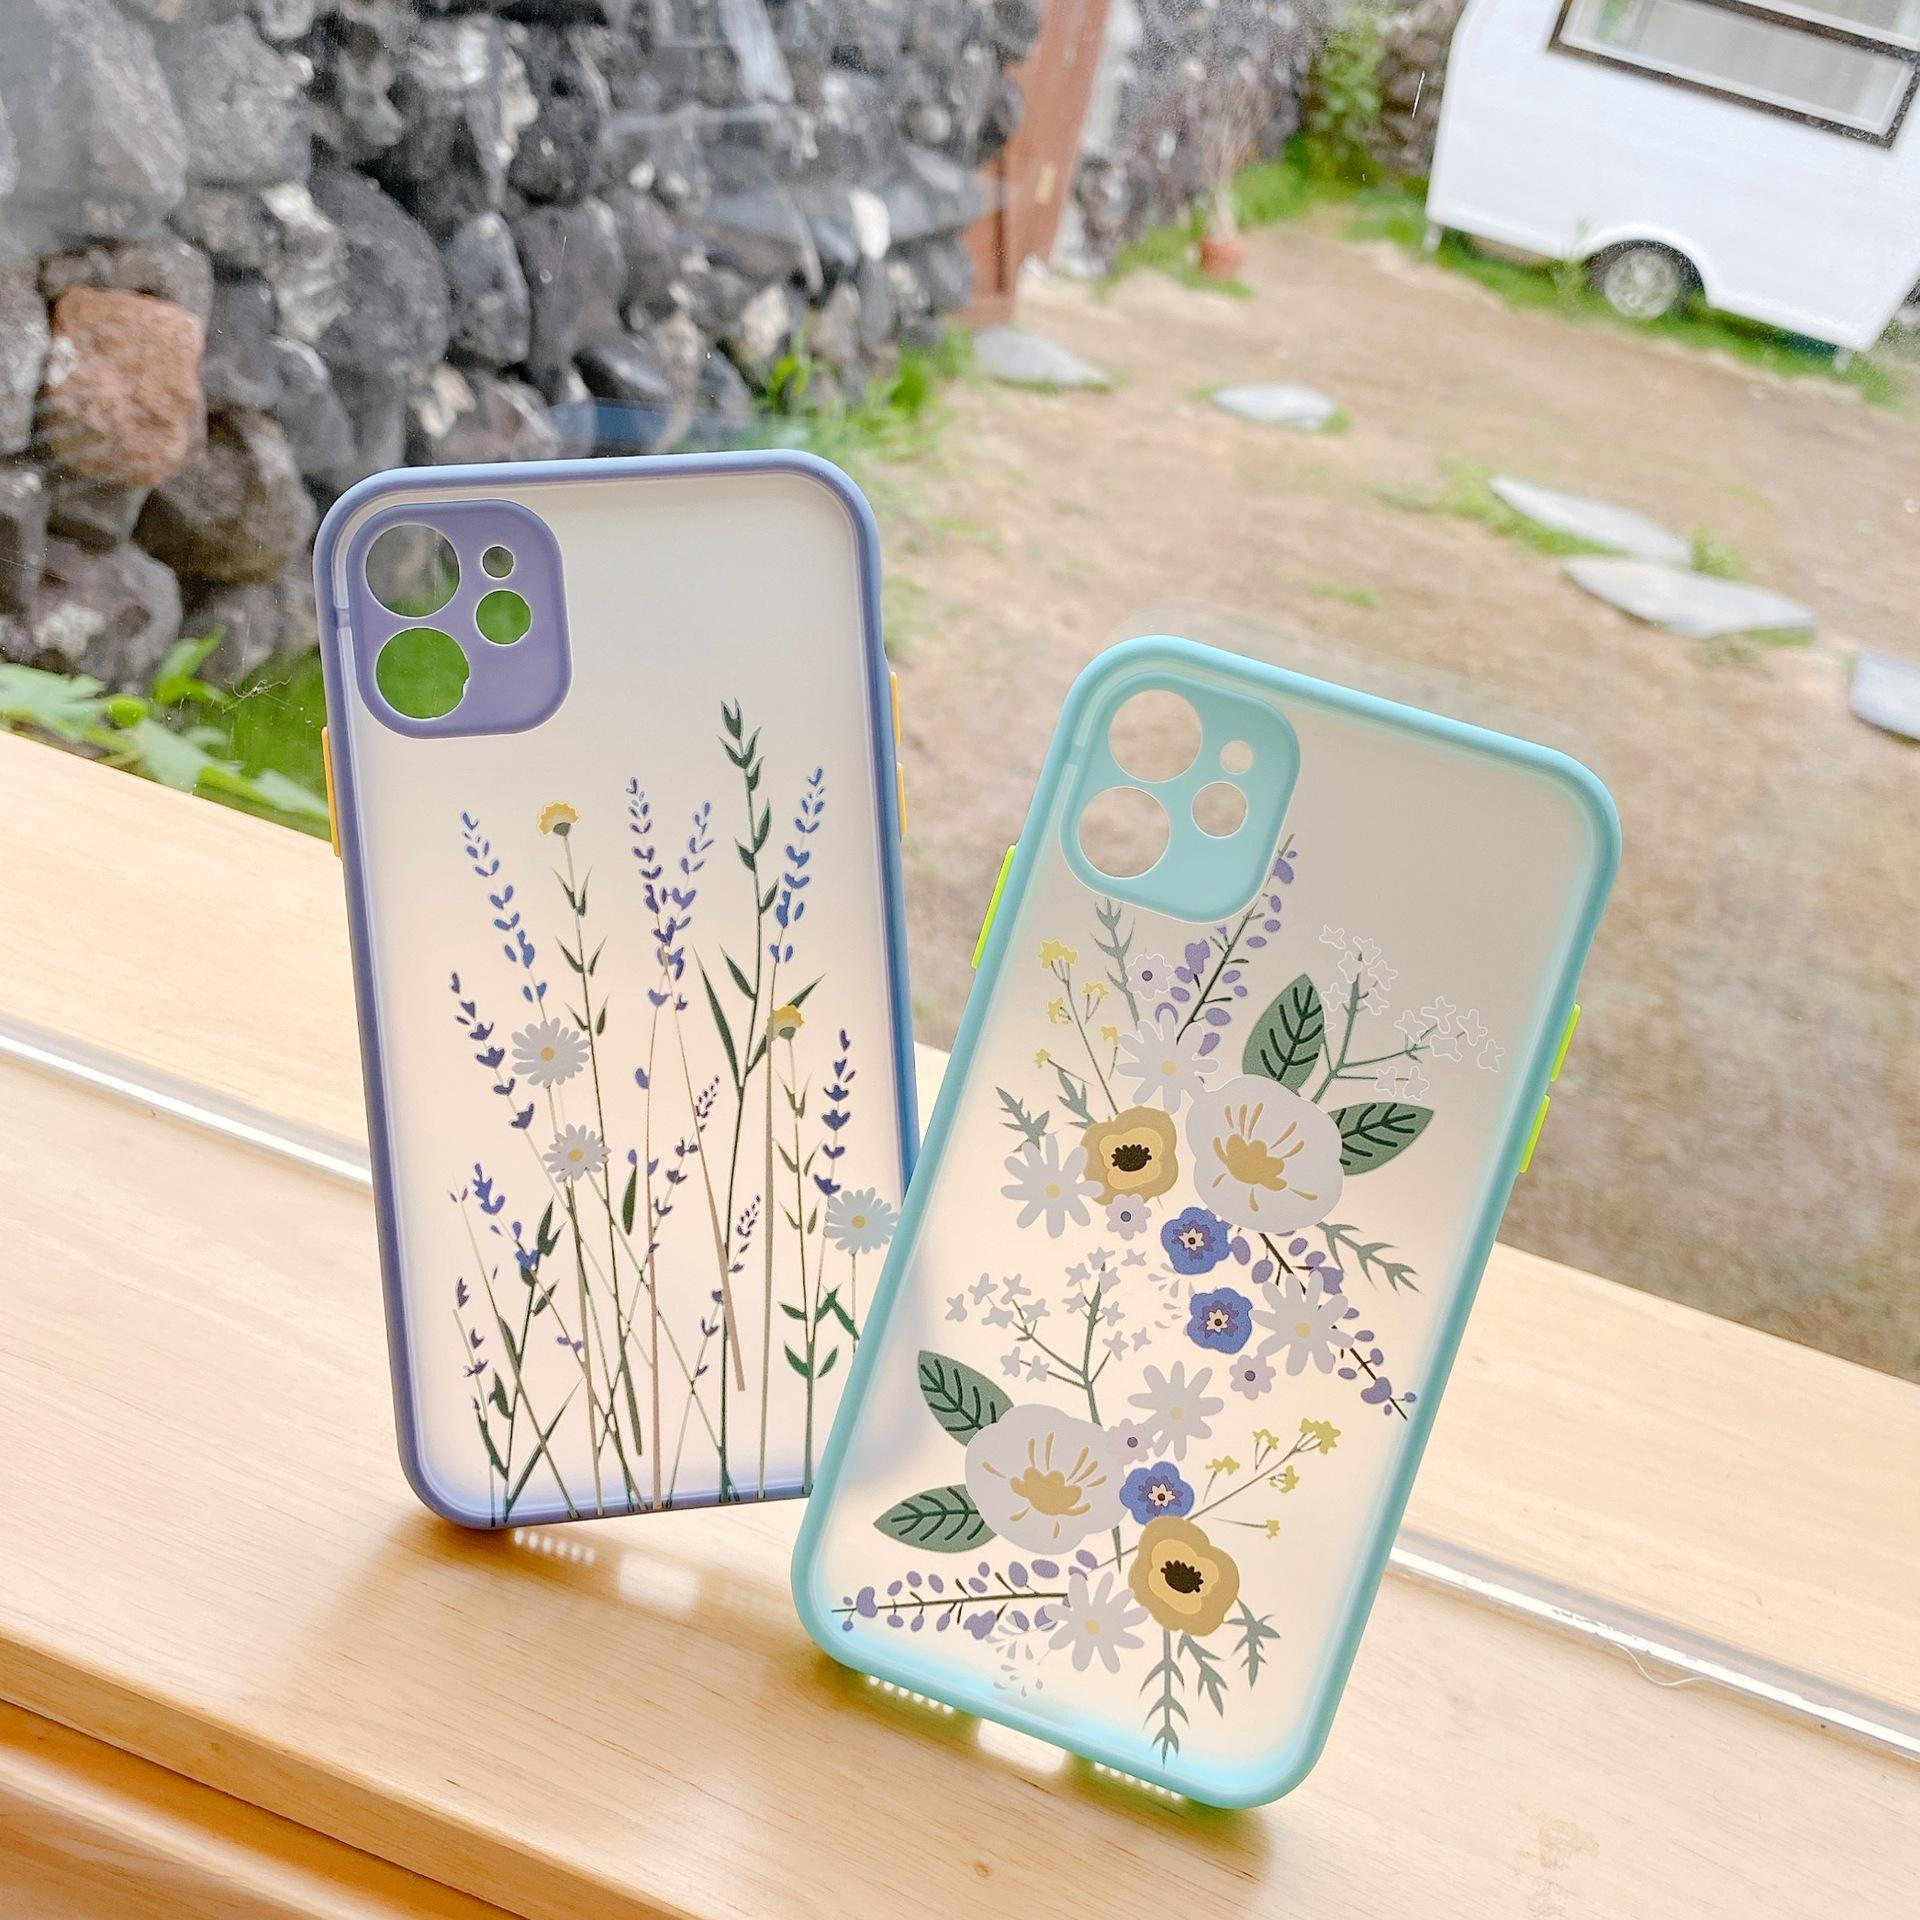 Luxury 3D Flower Cases For iPhone 12 11 promax XR 7 8 PLUS XS Soft Bumper Transparent Matte PC Back Cover Free Ship